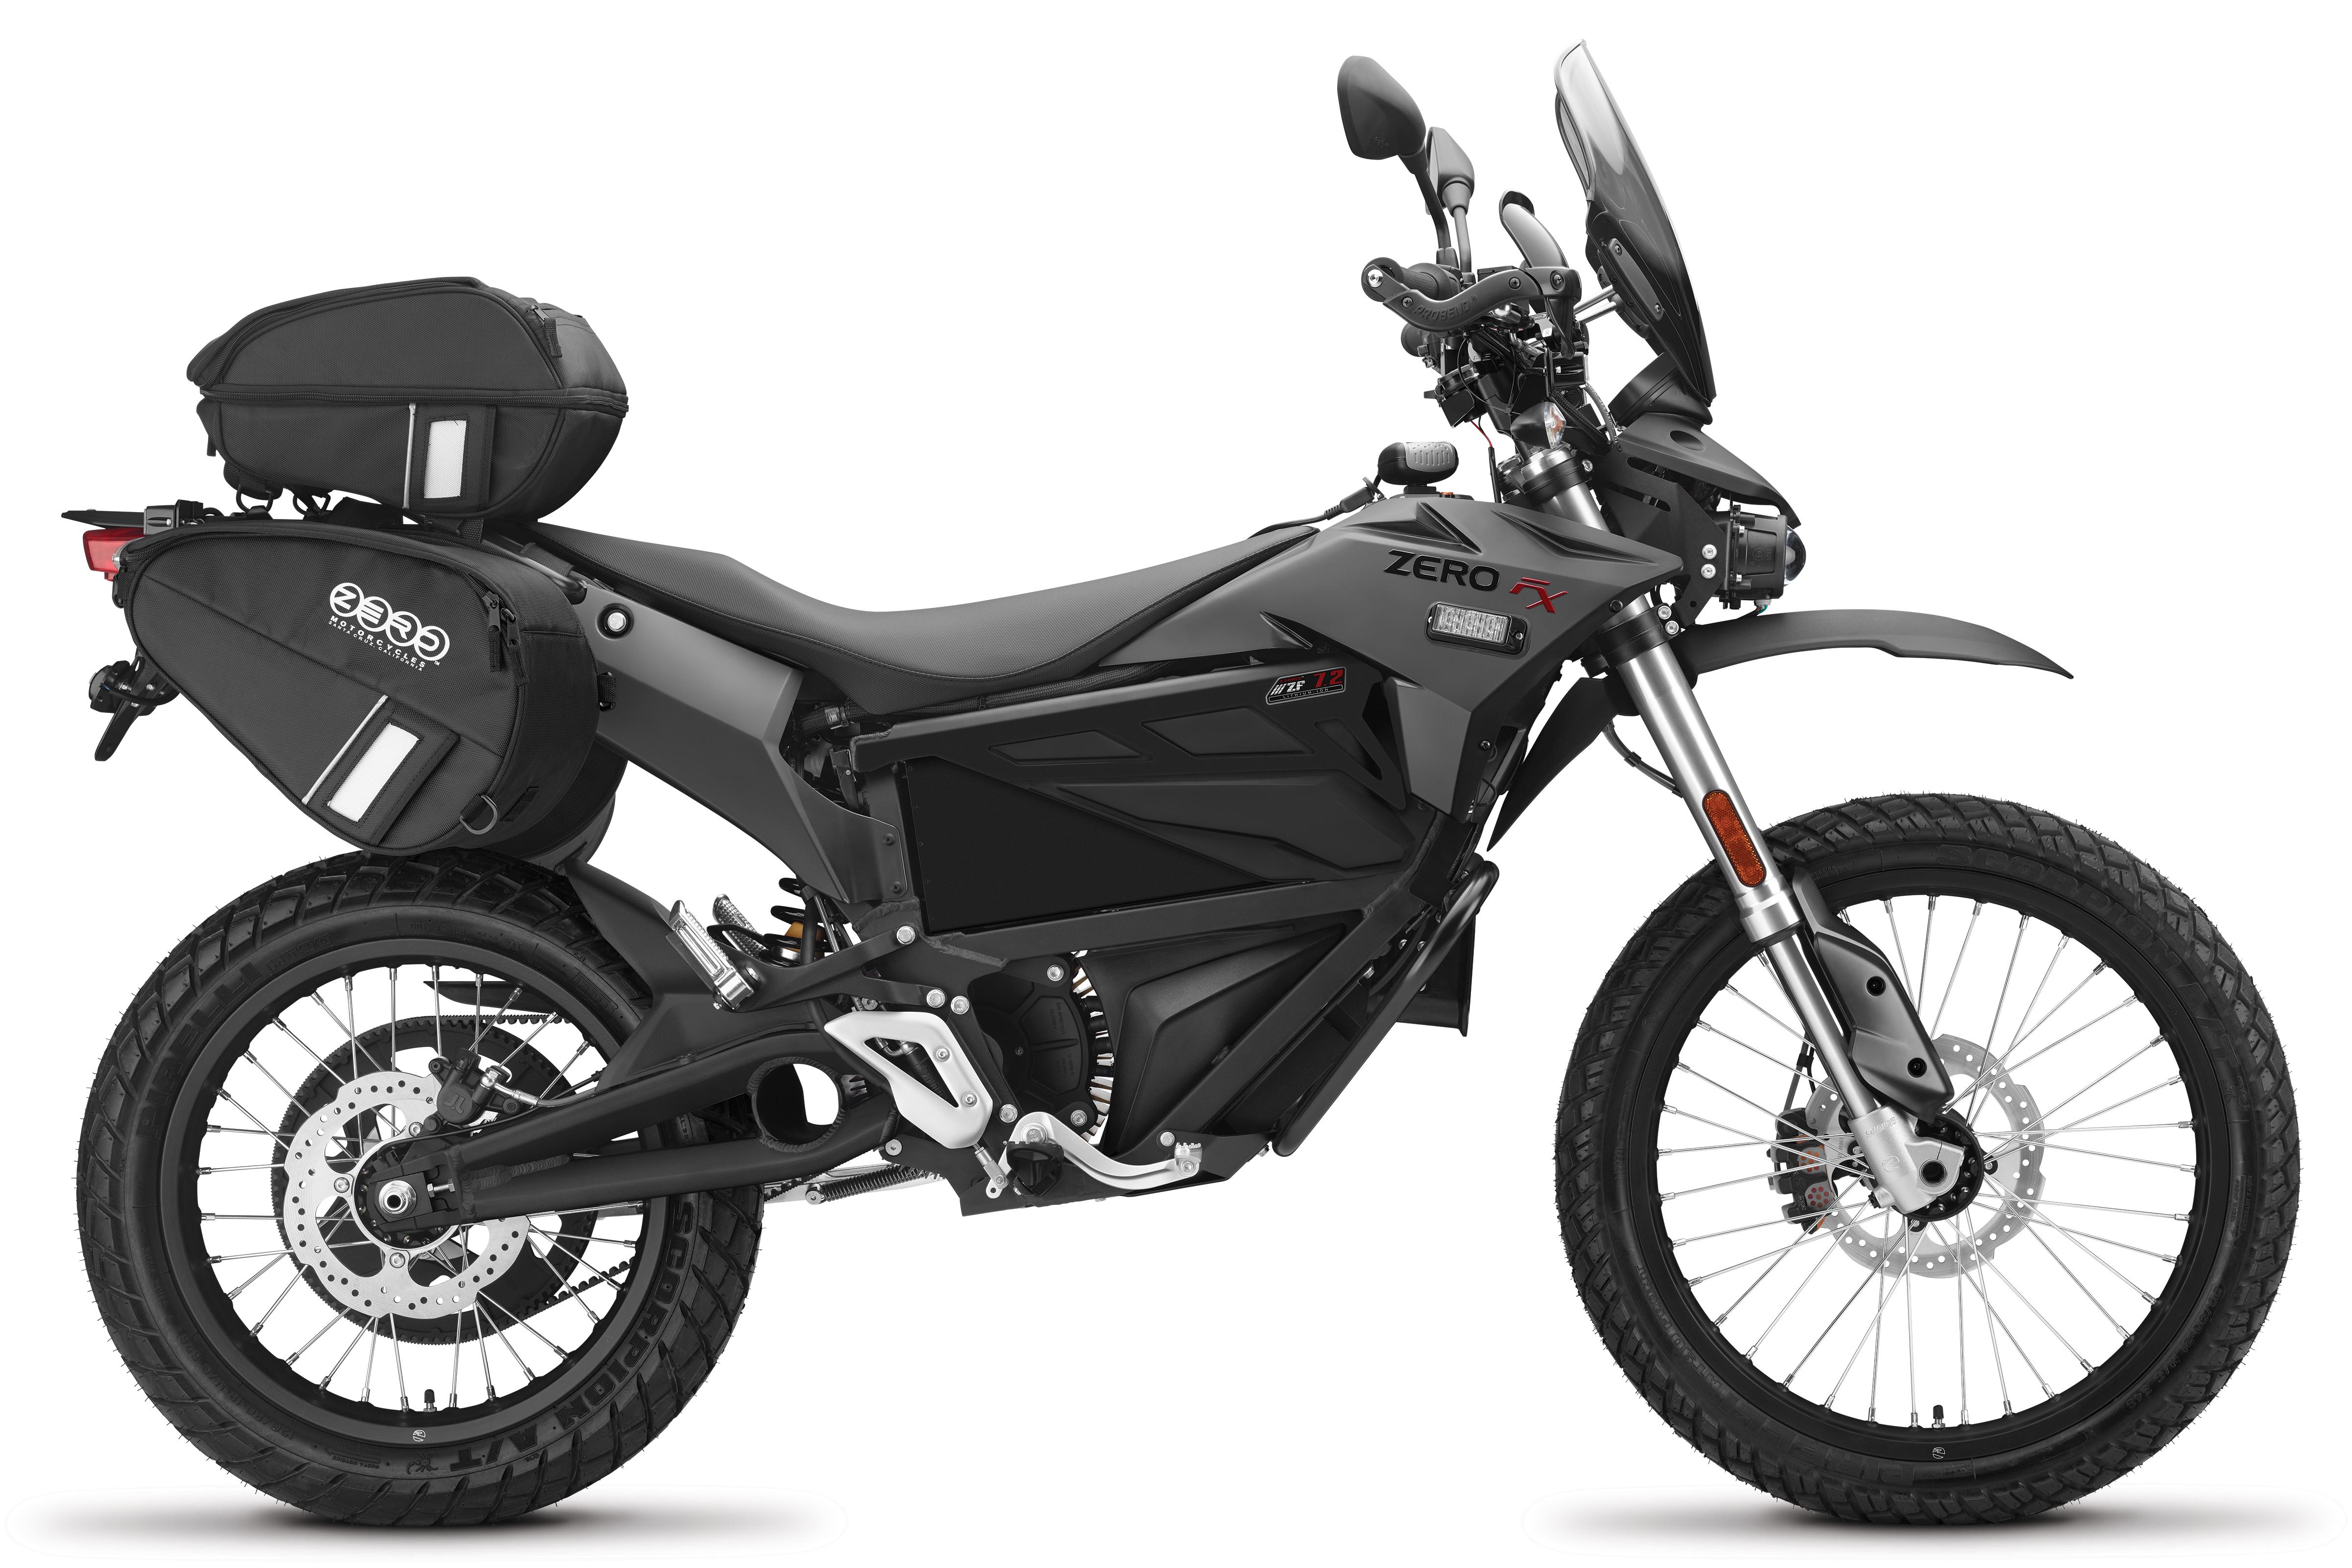 2018 Zero FXP Electric Motorcycle: Right Profile, White Background